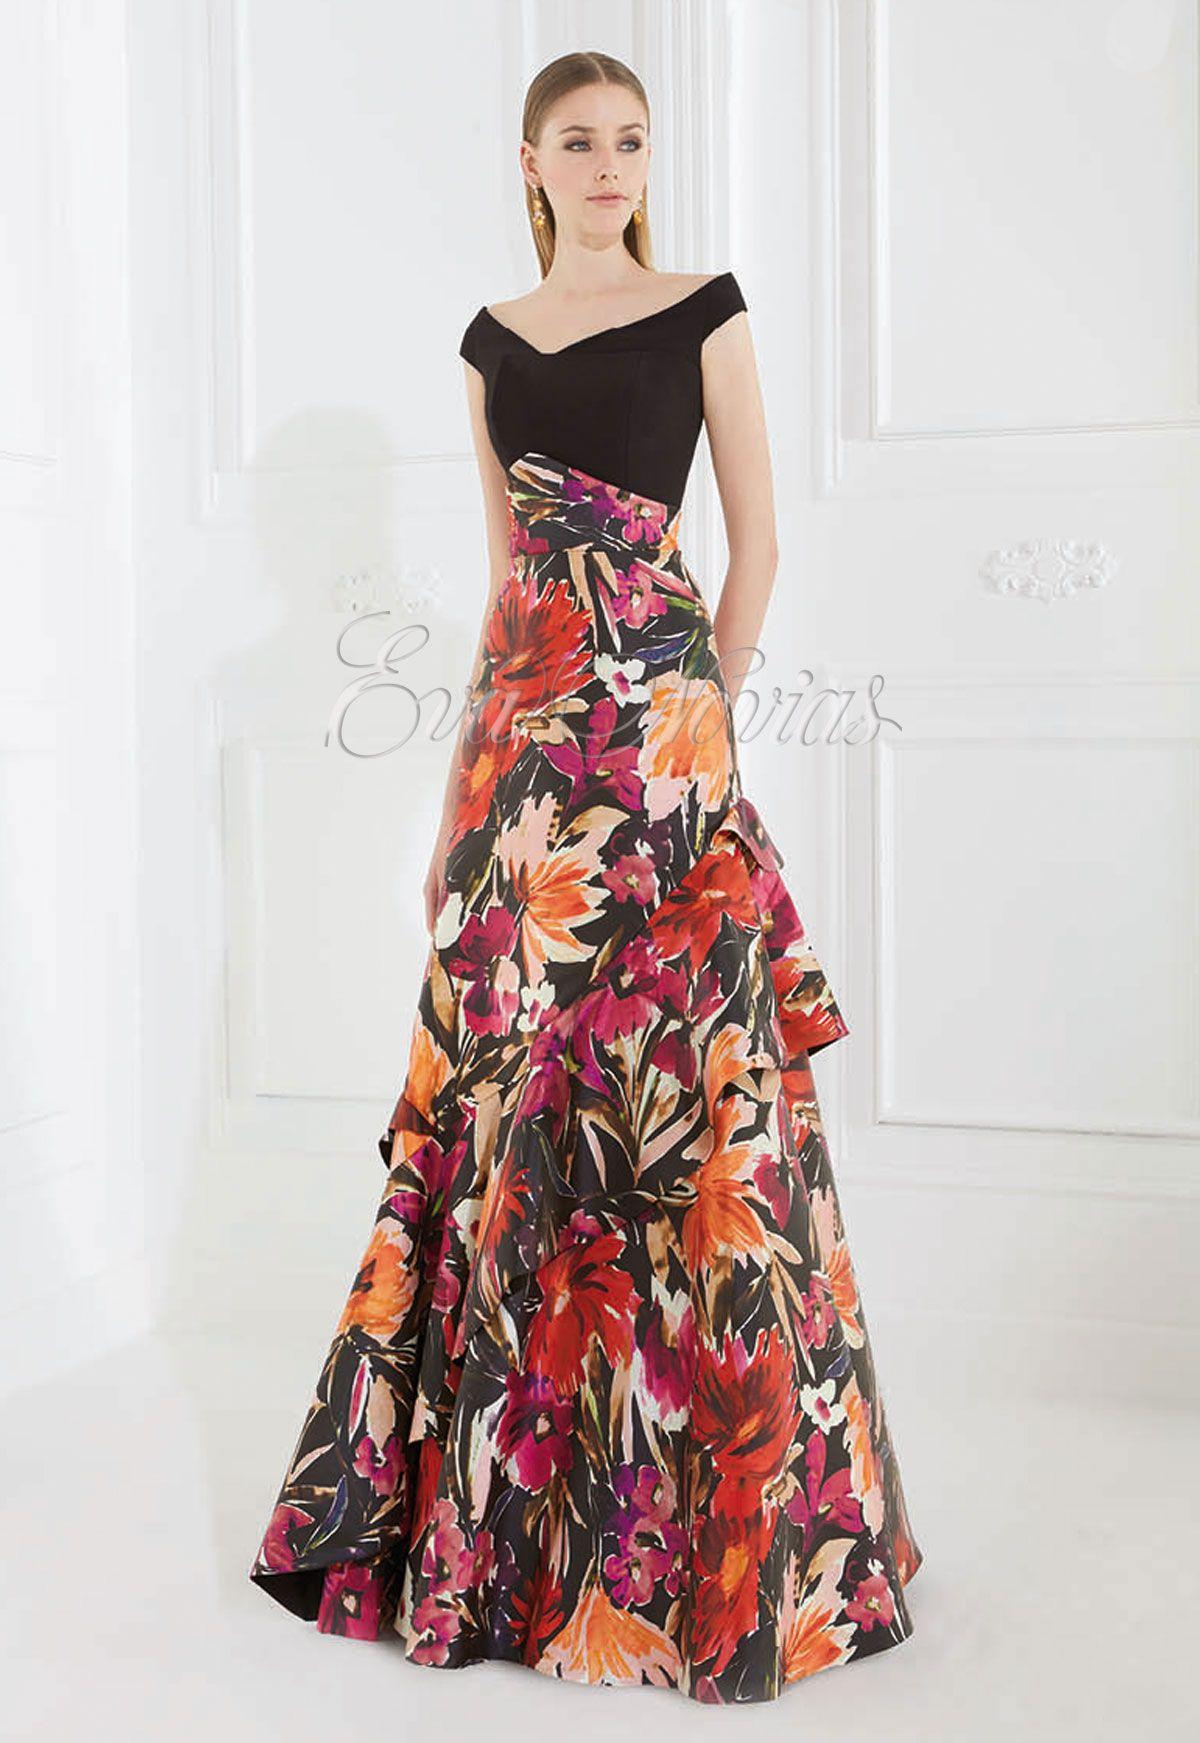 5462c01d9f Vestido de fiesta Patricia Avendaño 2016 Modelo 1985 en Eva Novias Madrid.   vestido  boda  invitada  modamujer  dress  fashion  madrina  estampados